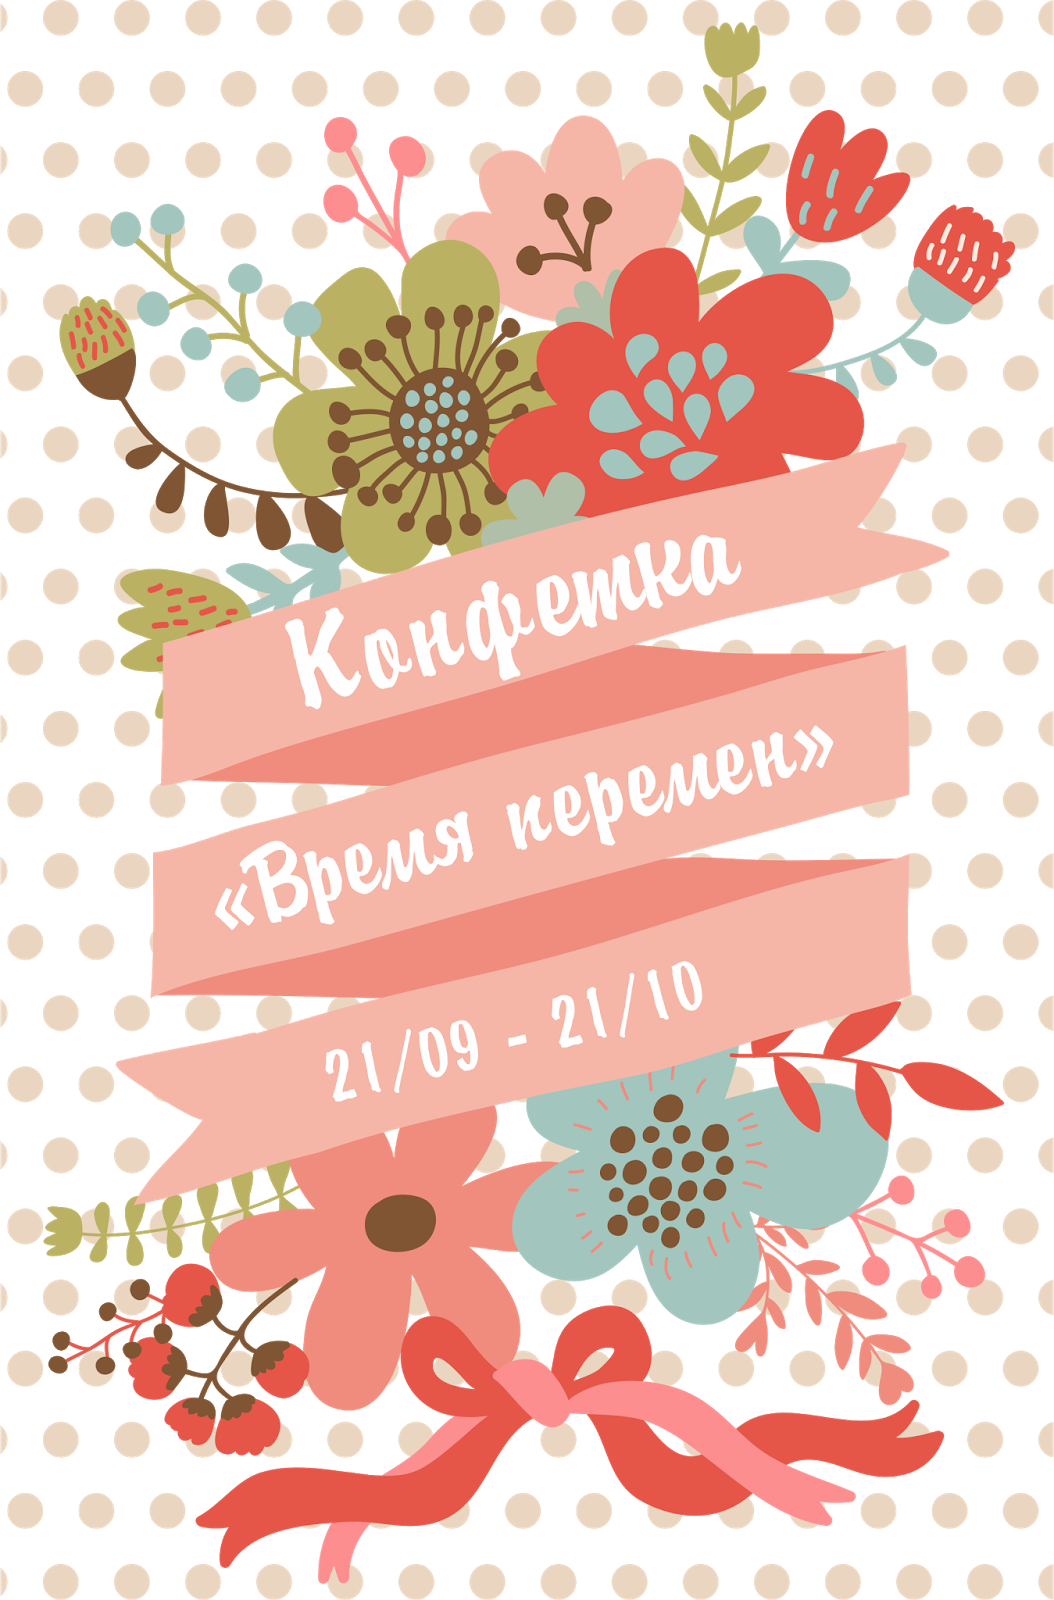 конфета до 21 октября